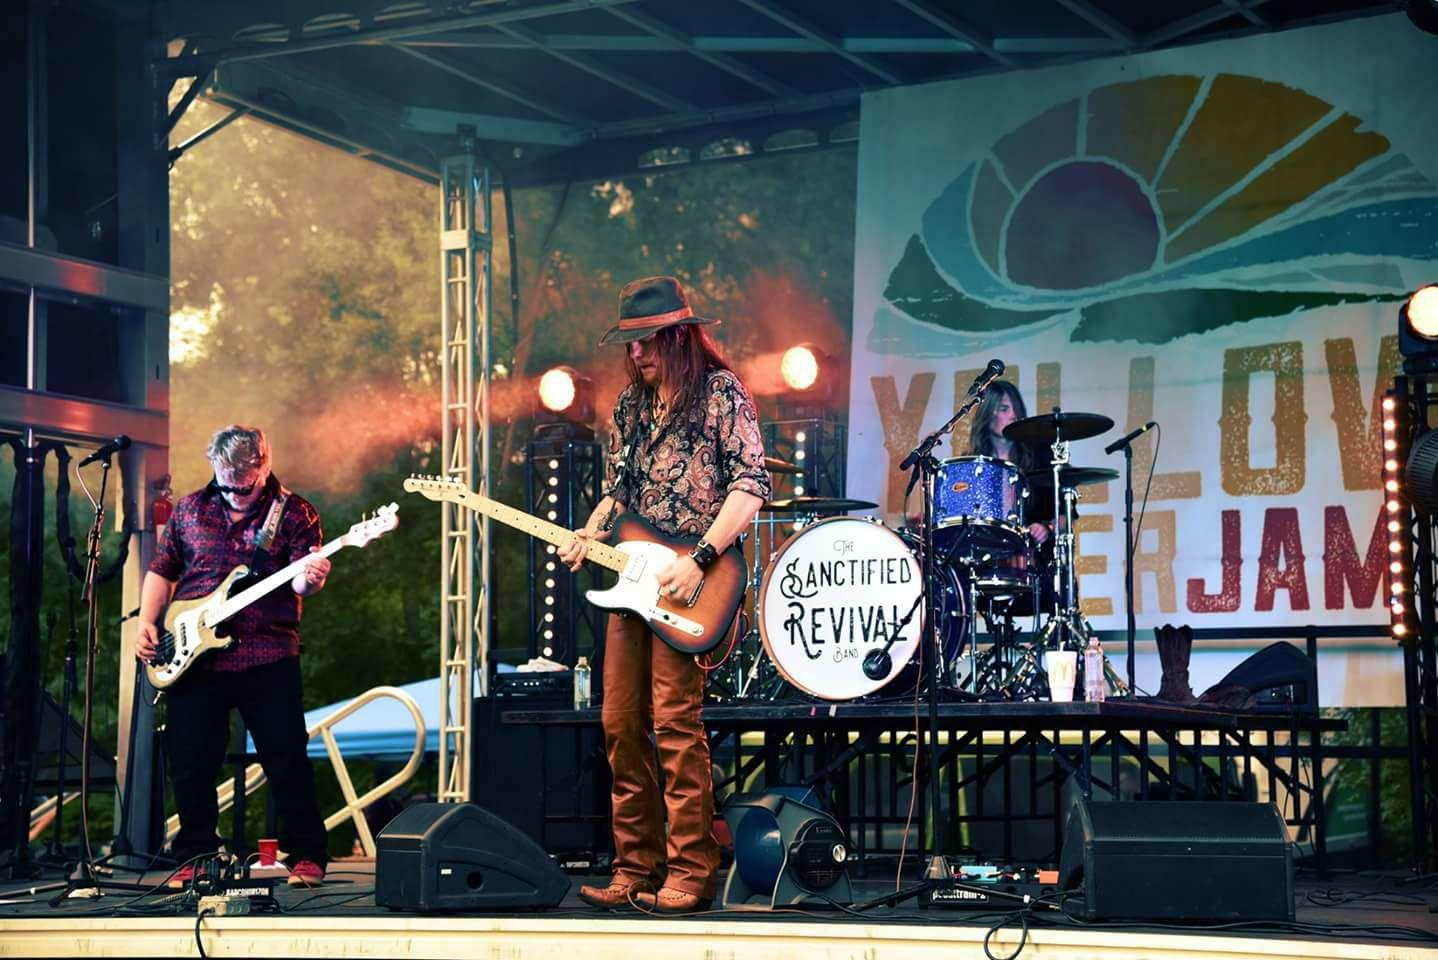 Sancified Revival Band |LakeOconeeLife.com